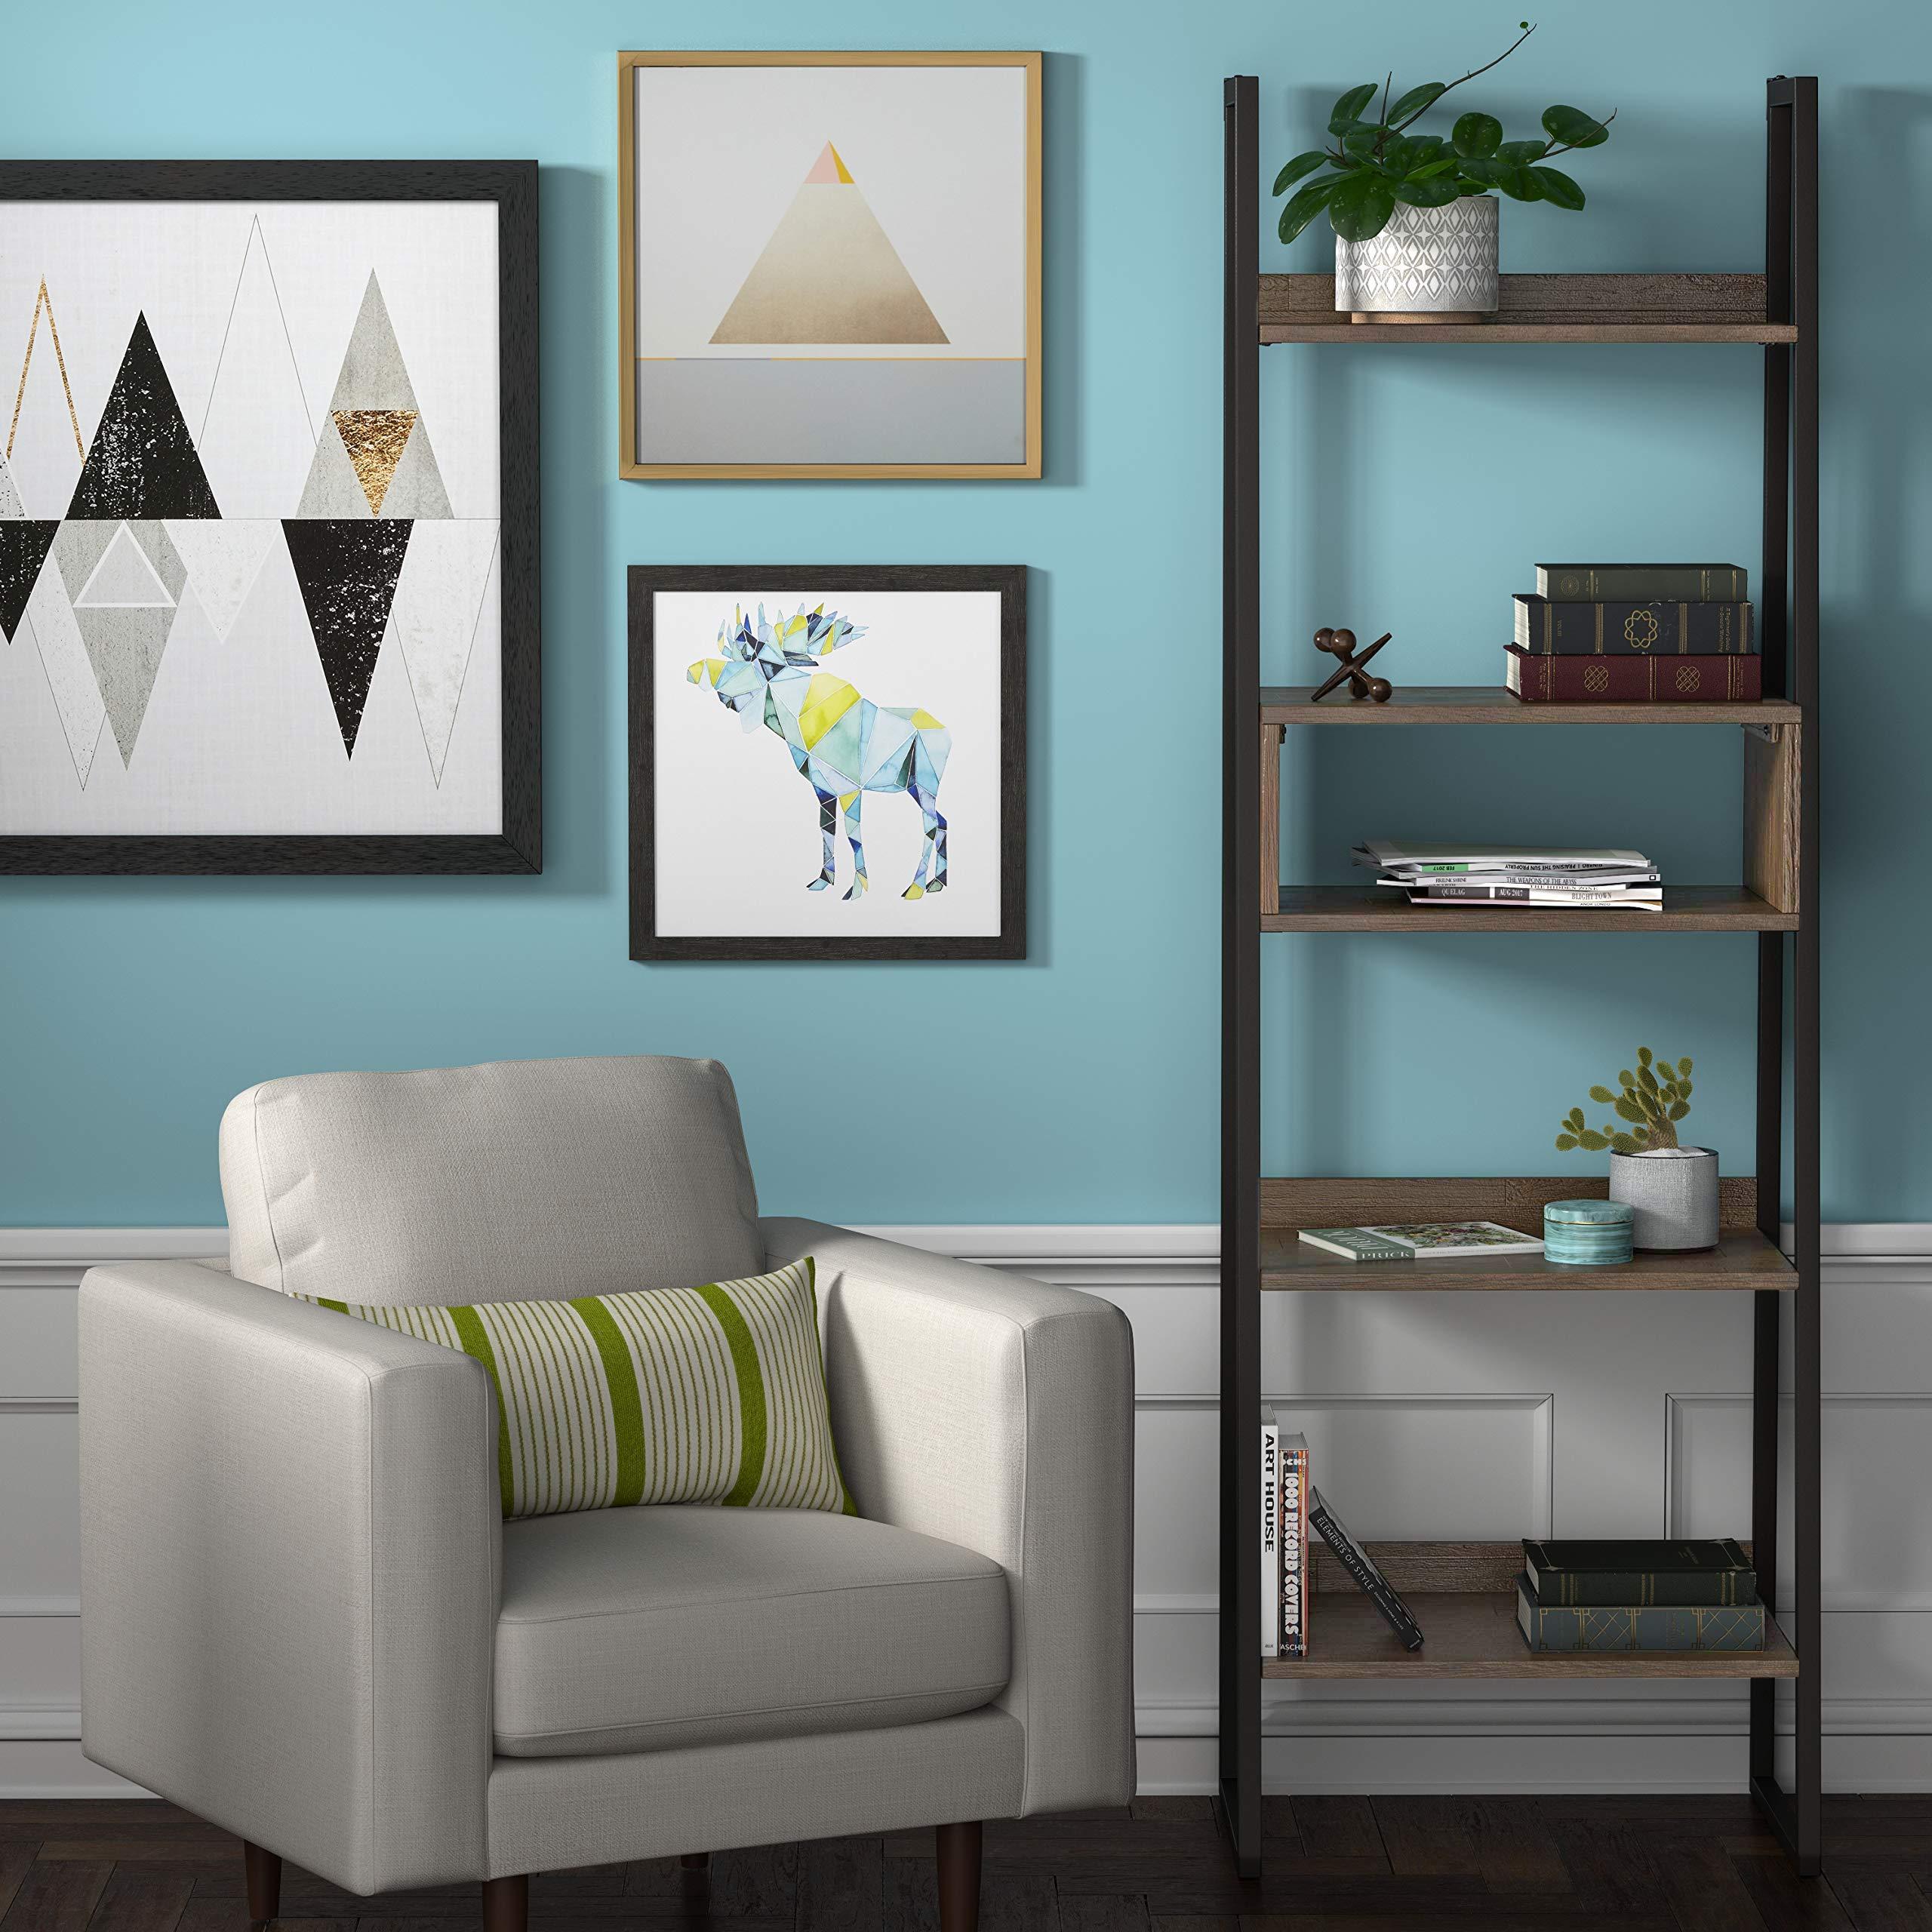 Rivet Roxmere Modern Bookcase, 23.6''W, Acacia, Sandblast Gray by Rivet (Image #2)